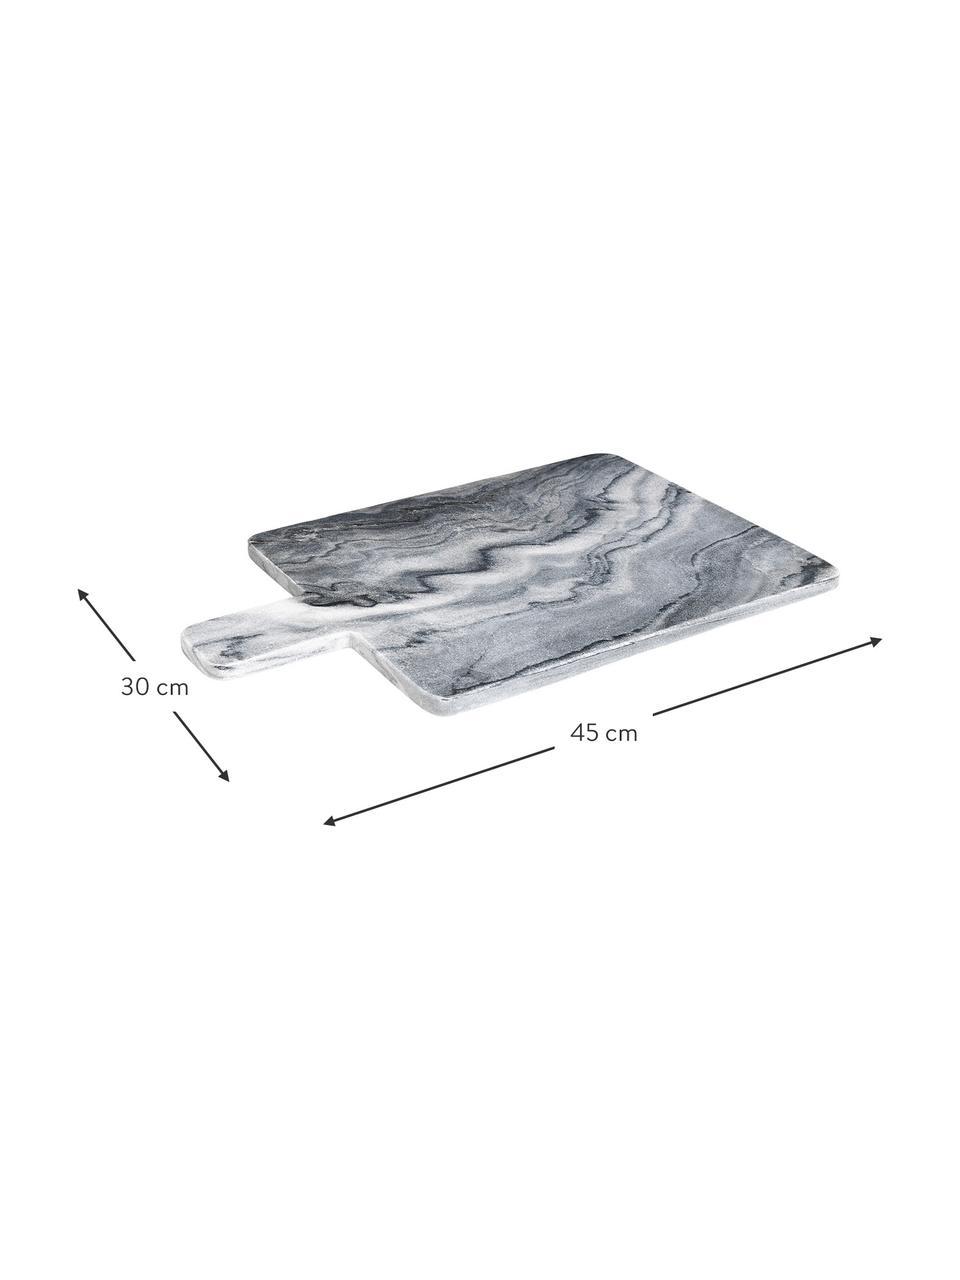 Marmor-Schneidebrett Adam, L 45 x B 30 cm, Marmor, Grau, 30 x 45 cm